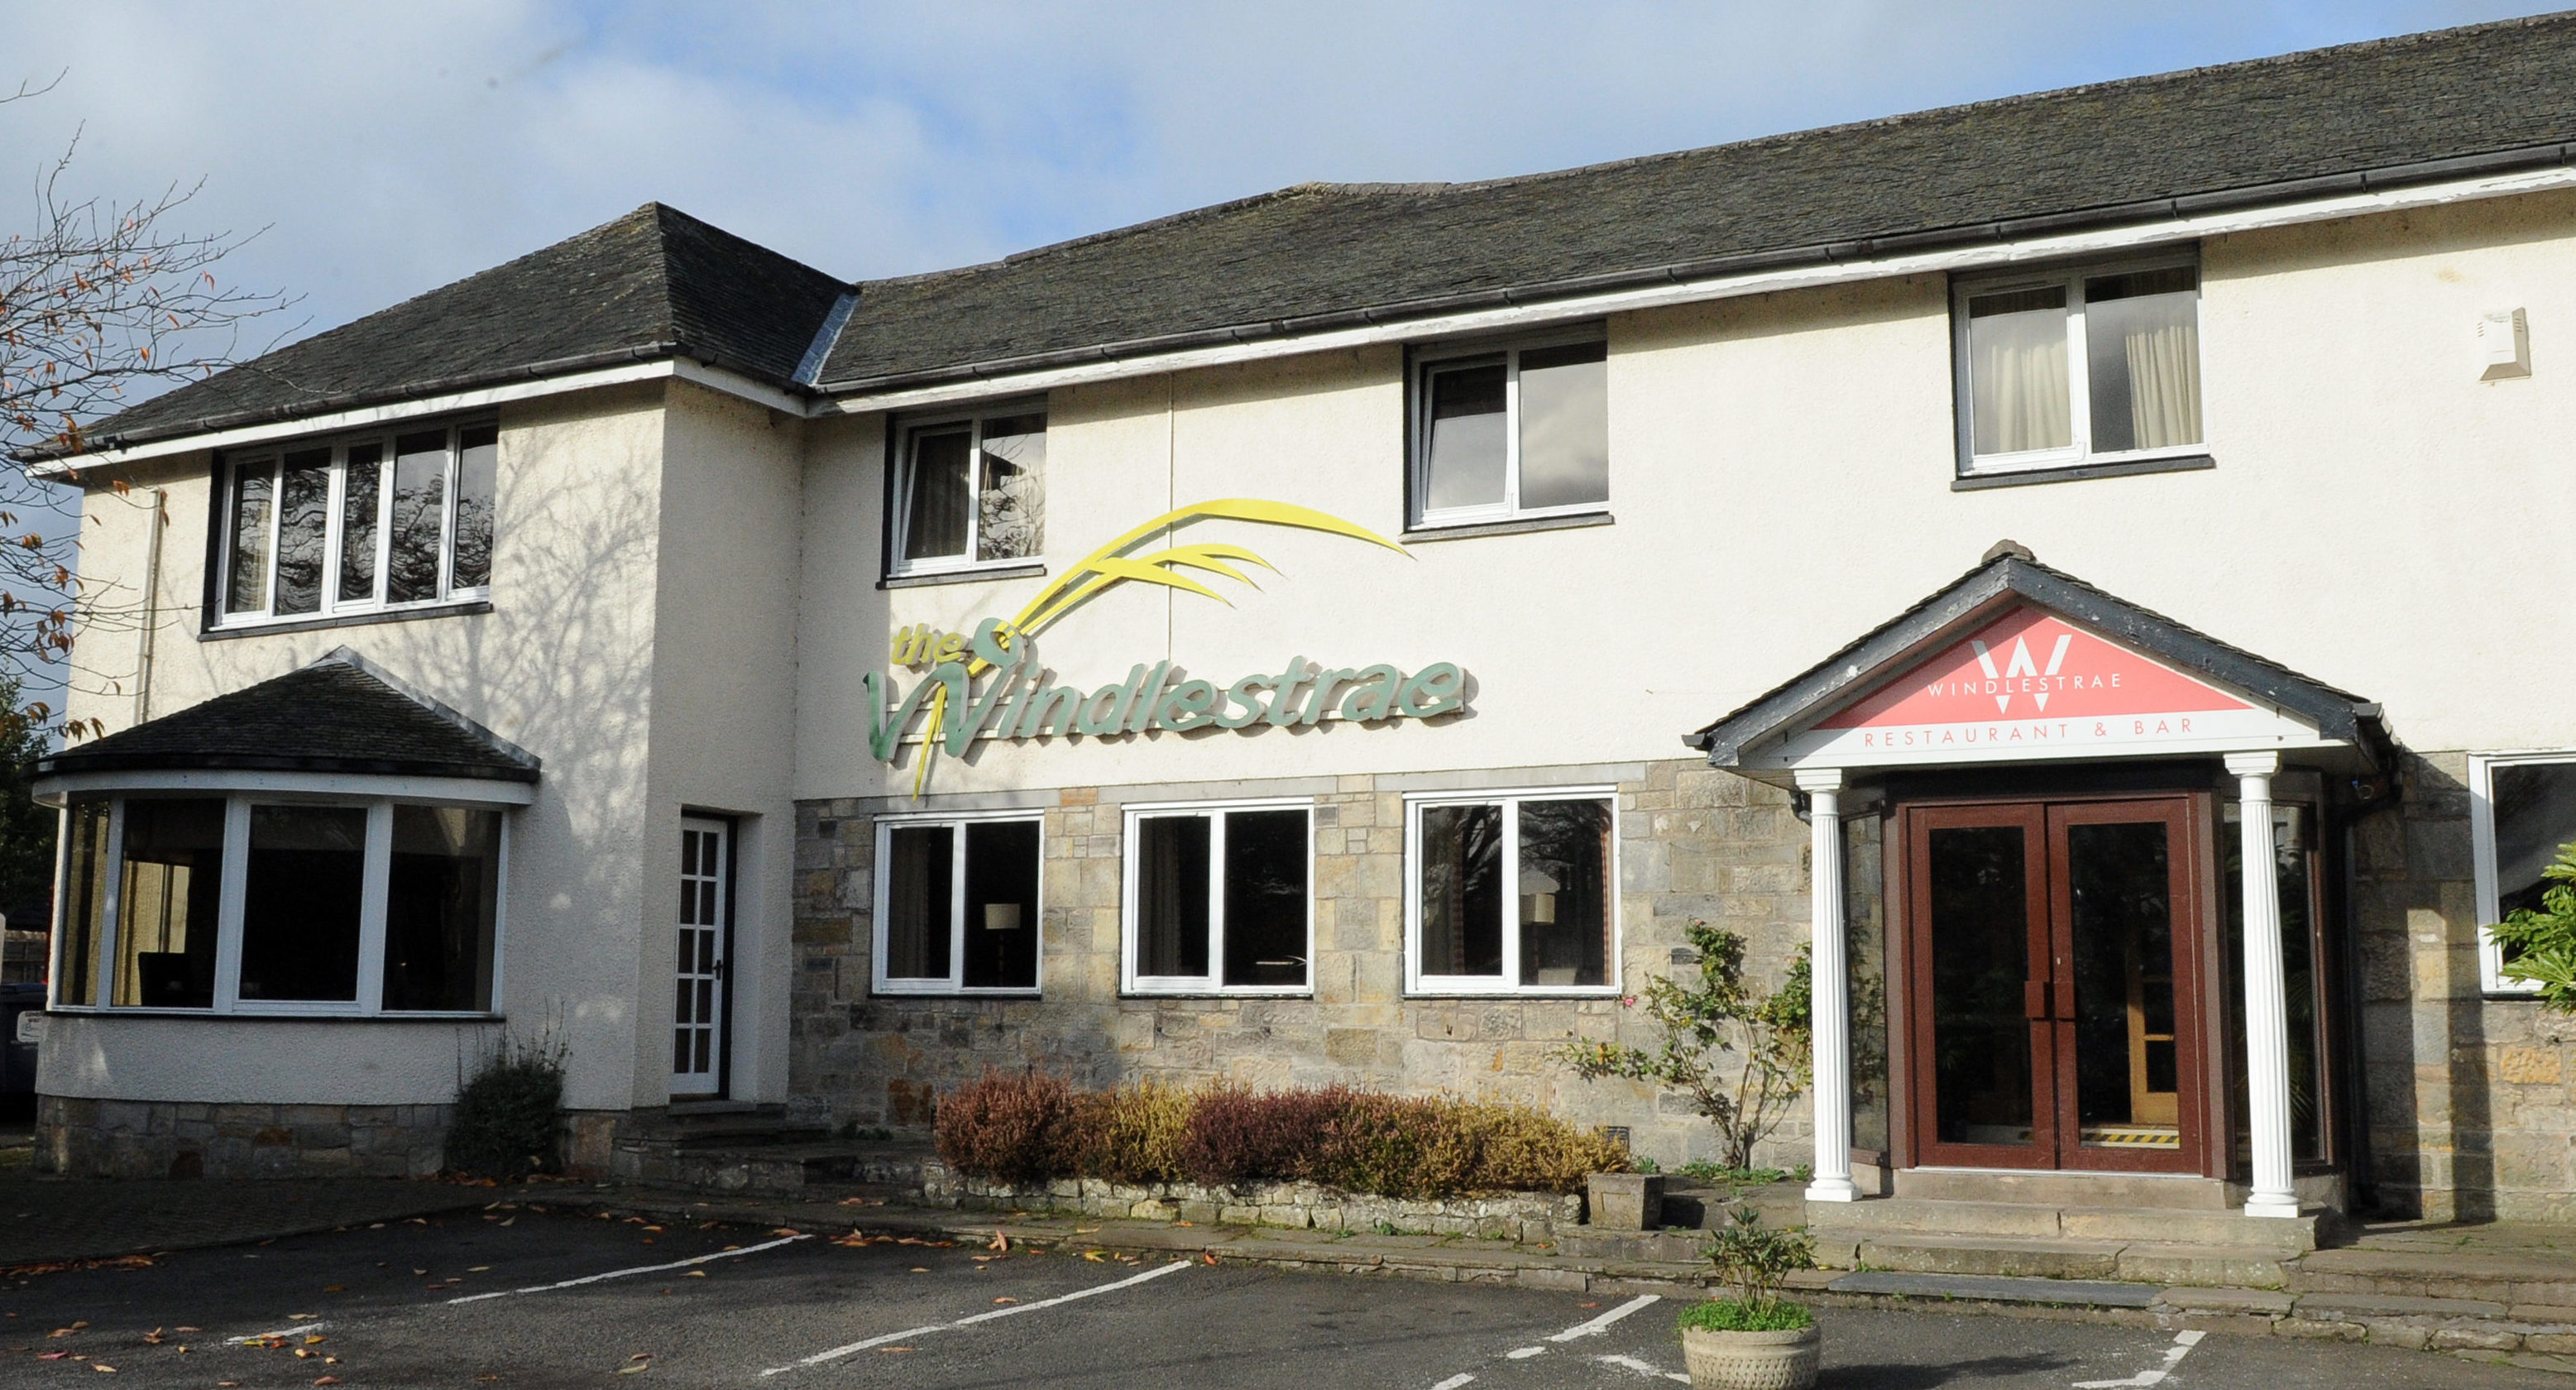 Windlestrae Hotel, Kinross.